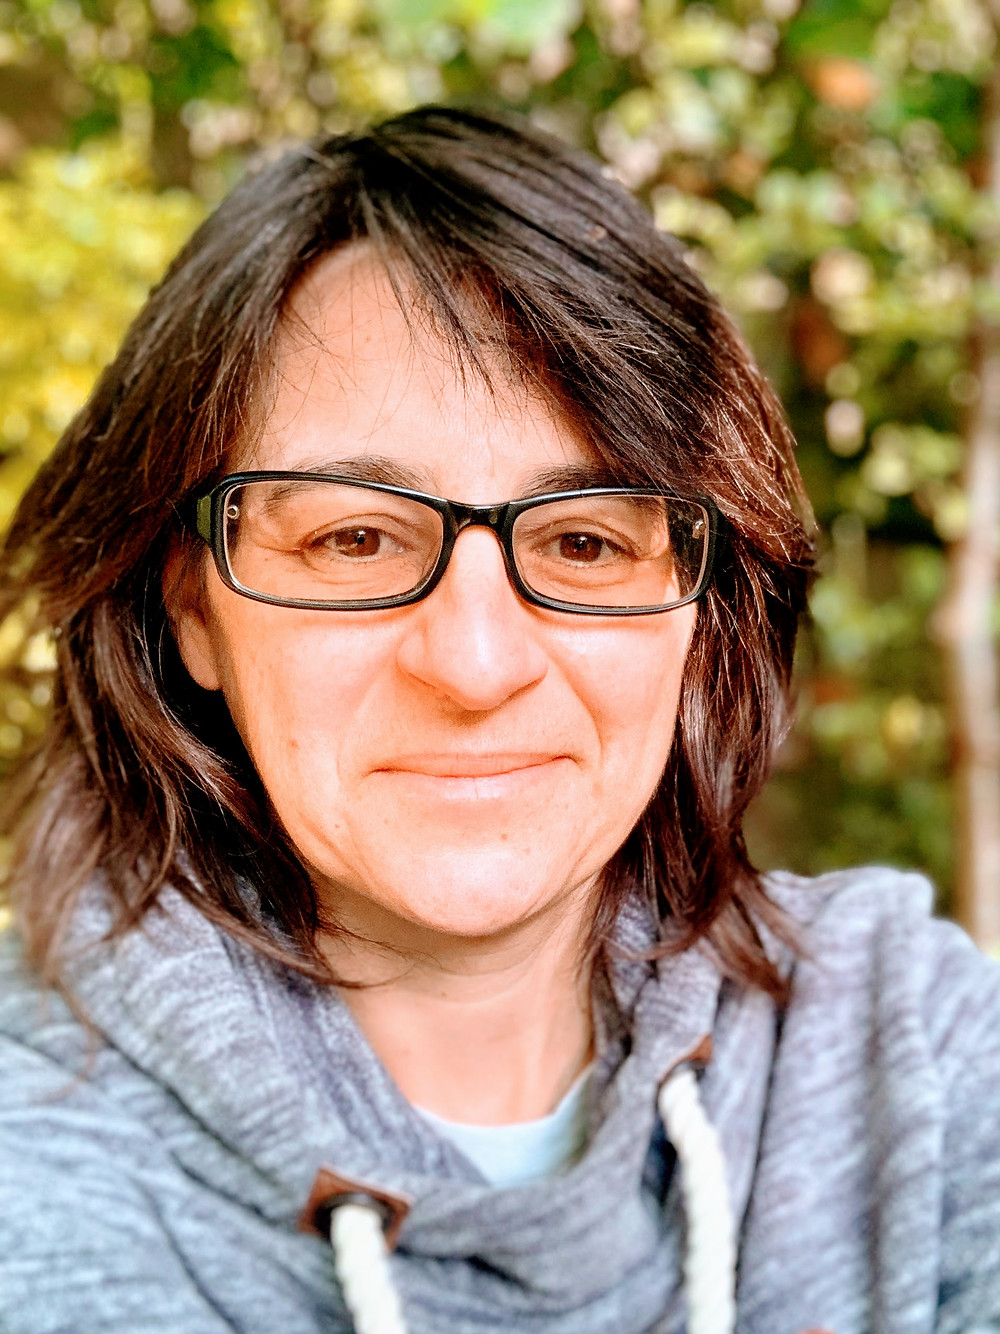 Rachel Simon - super friendly voice over artist